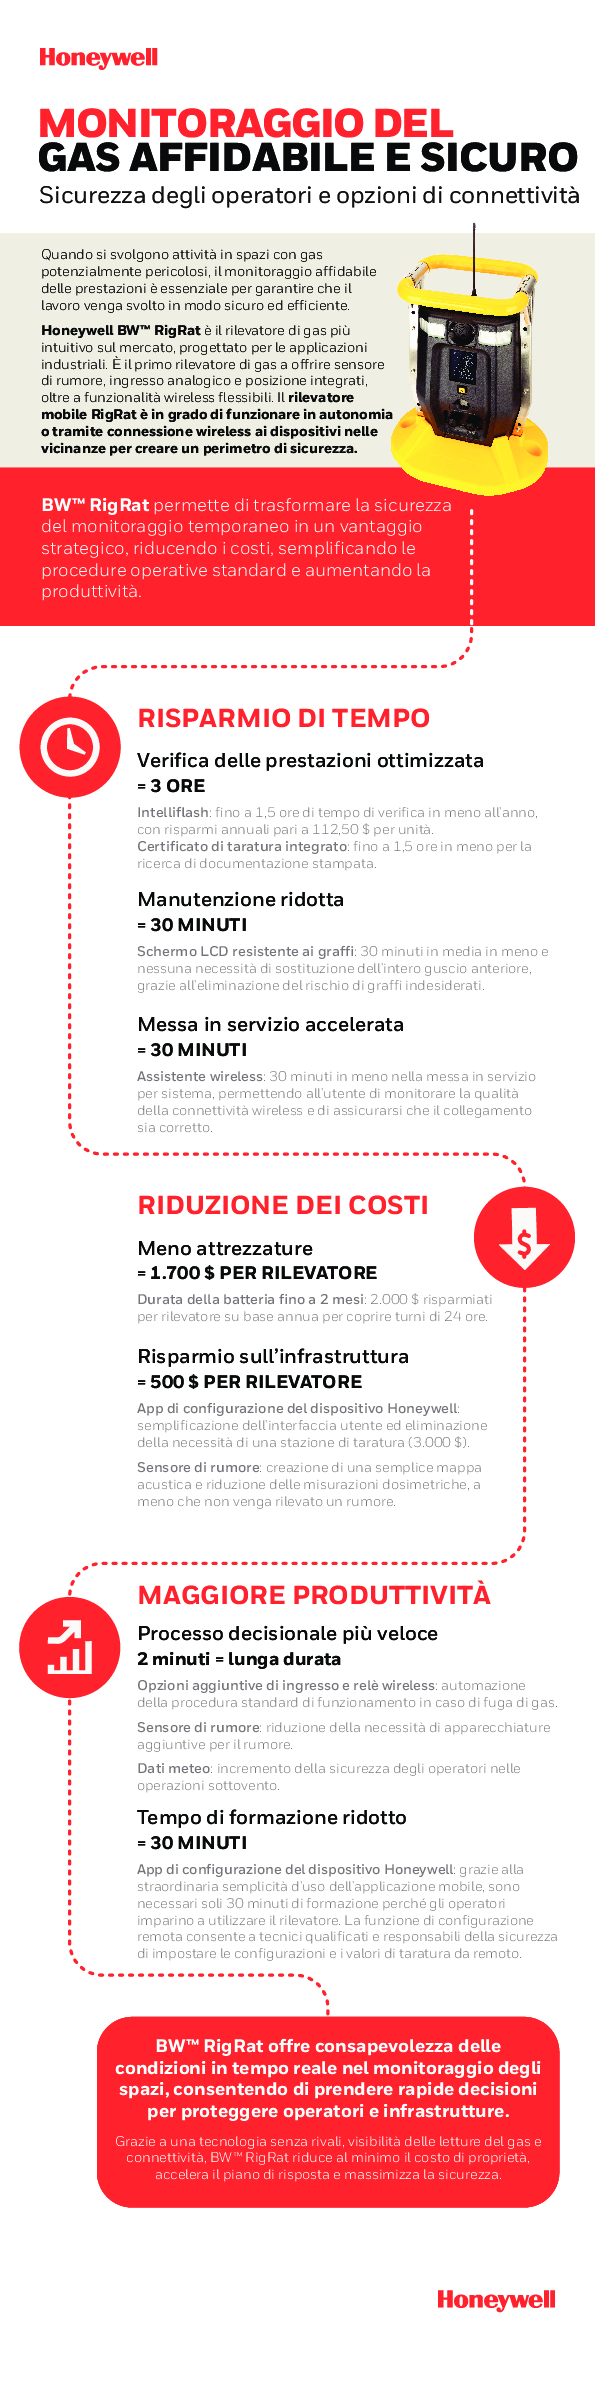 Thumb original pdf1 gas bw rig rat infographic it